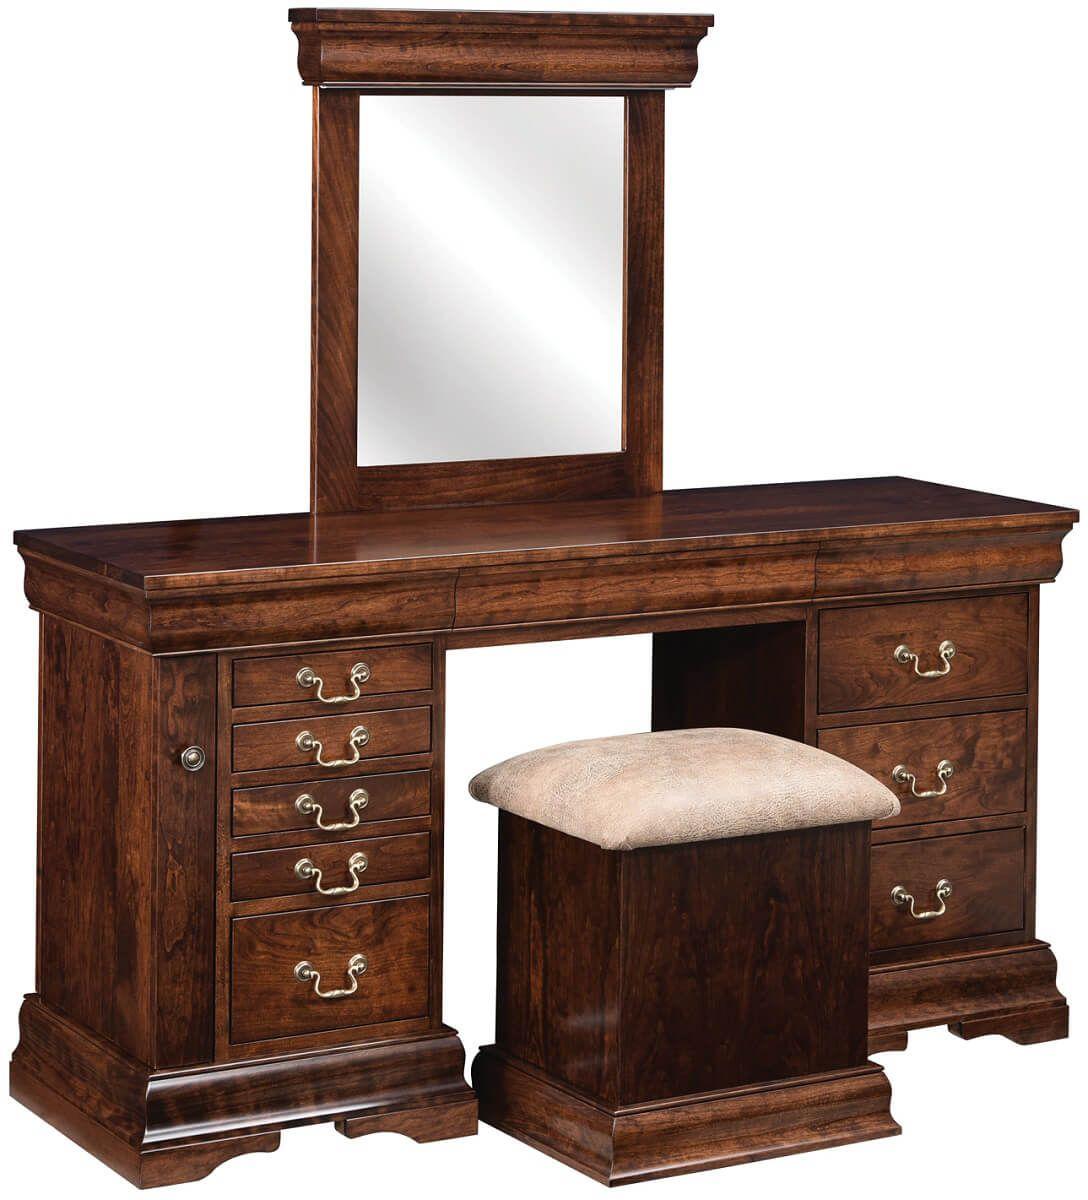 Glenburn Vanity Dresser and Bench